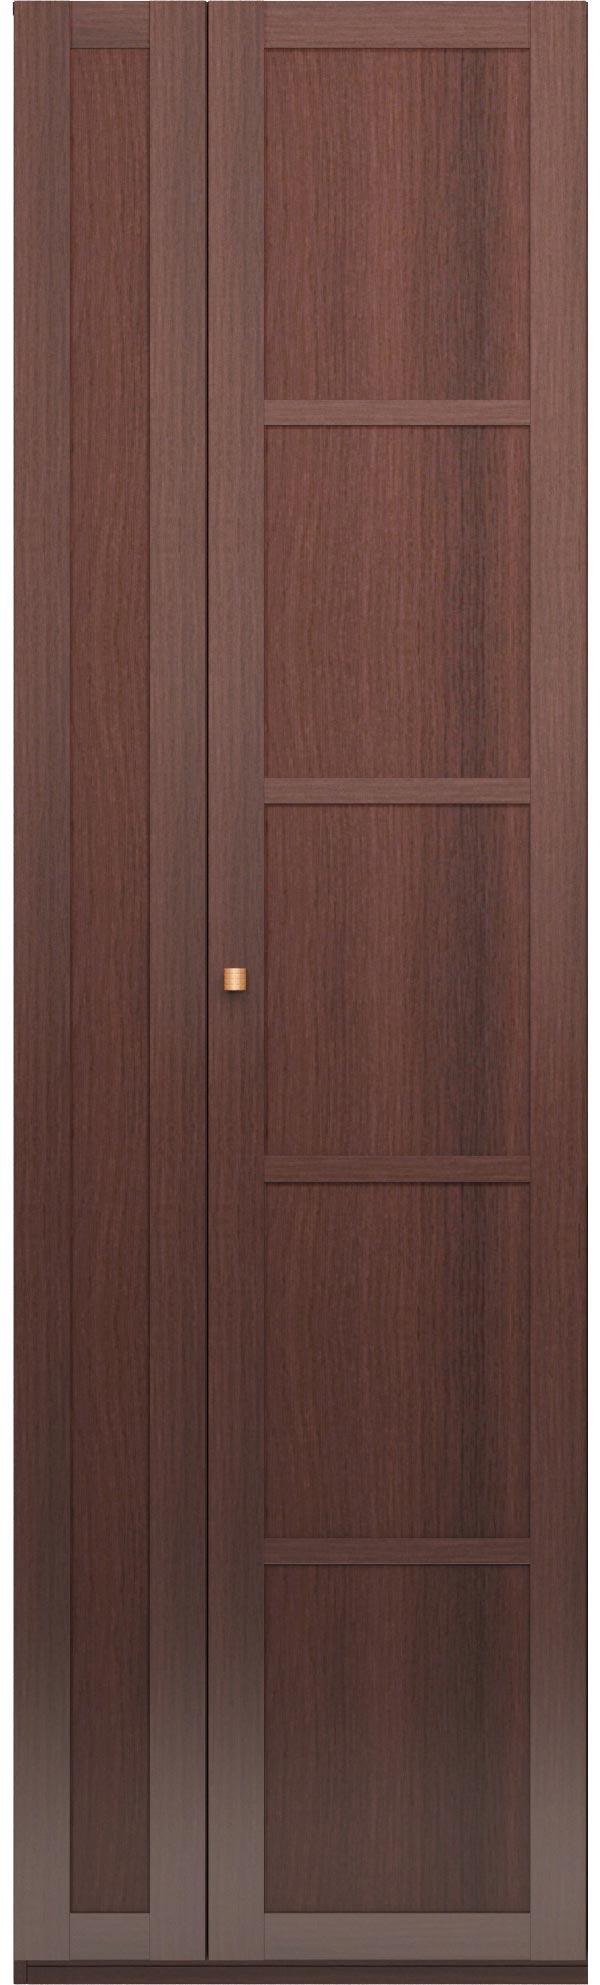 Шкаф для одежды (без зеркала) Ижмебель Скандинавия, арт. 44